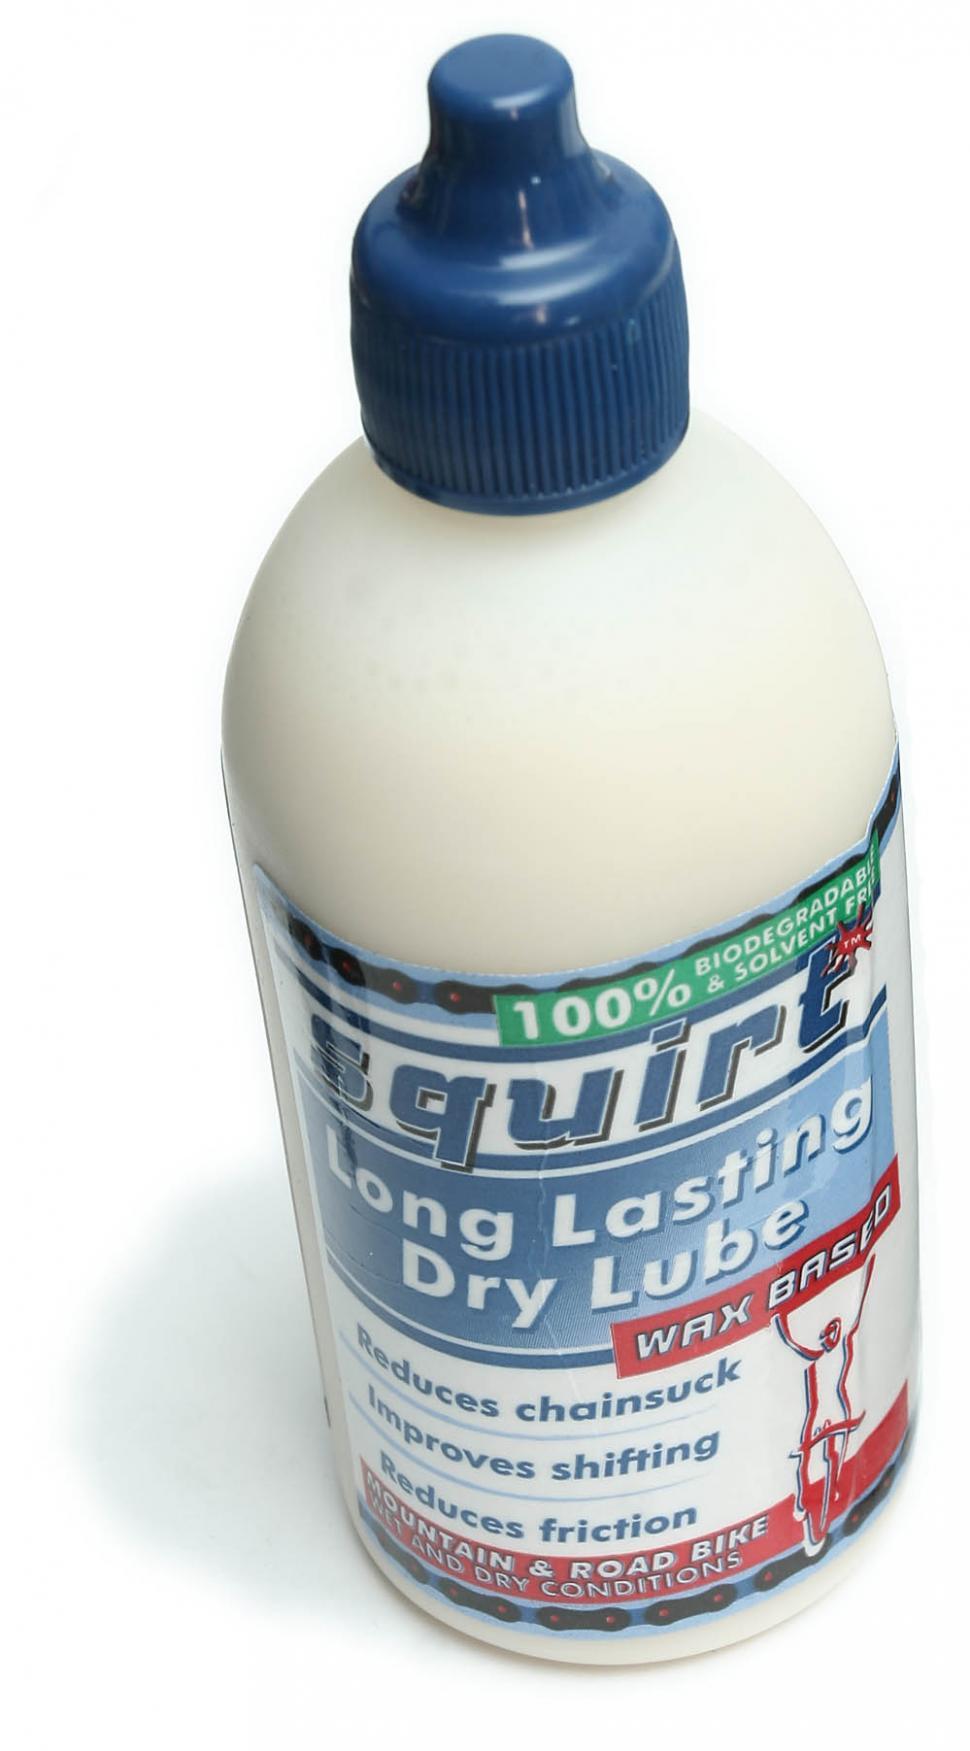 Squirt wax lube